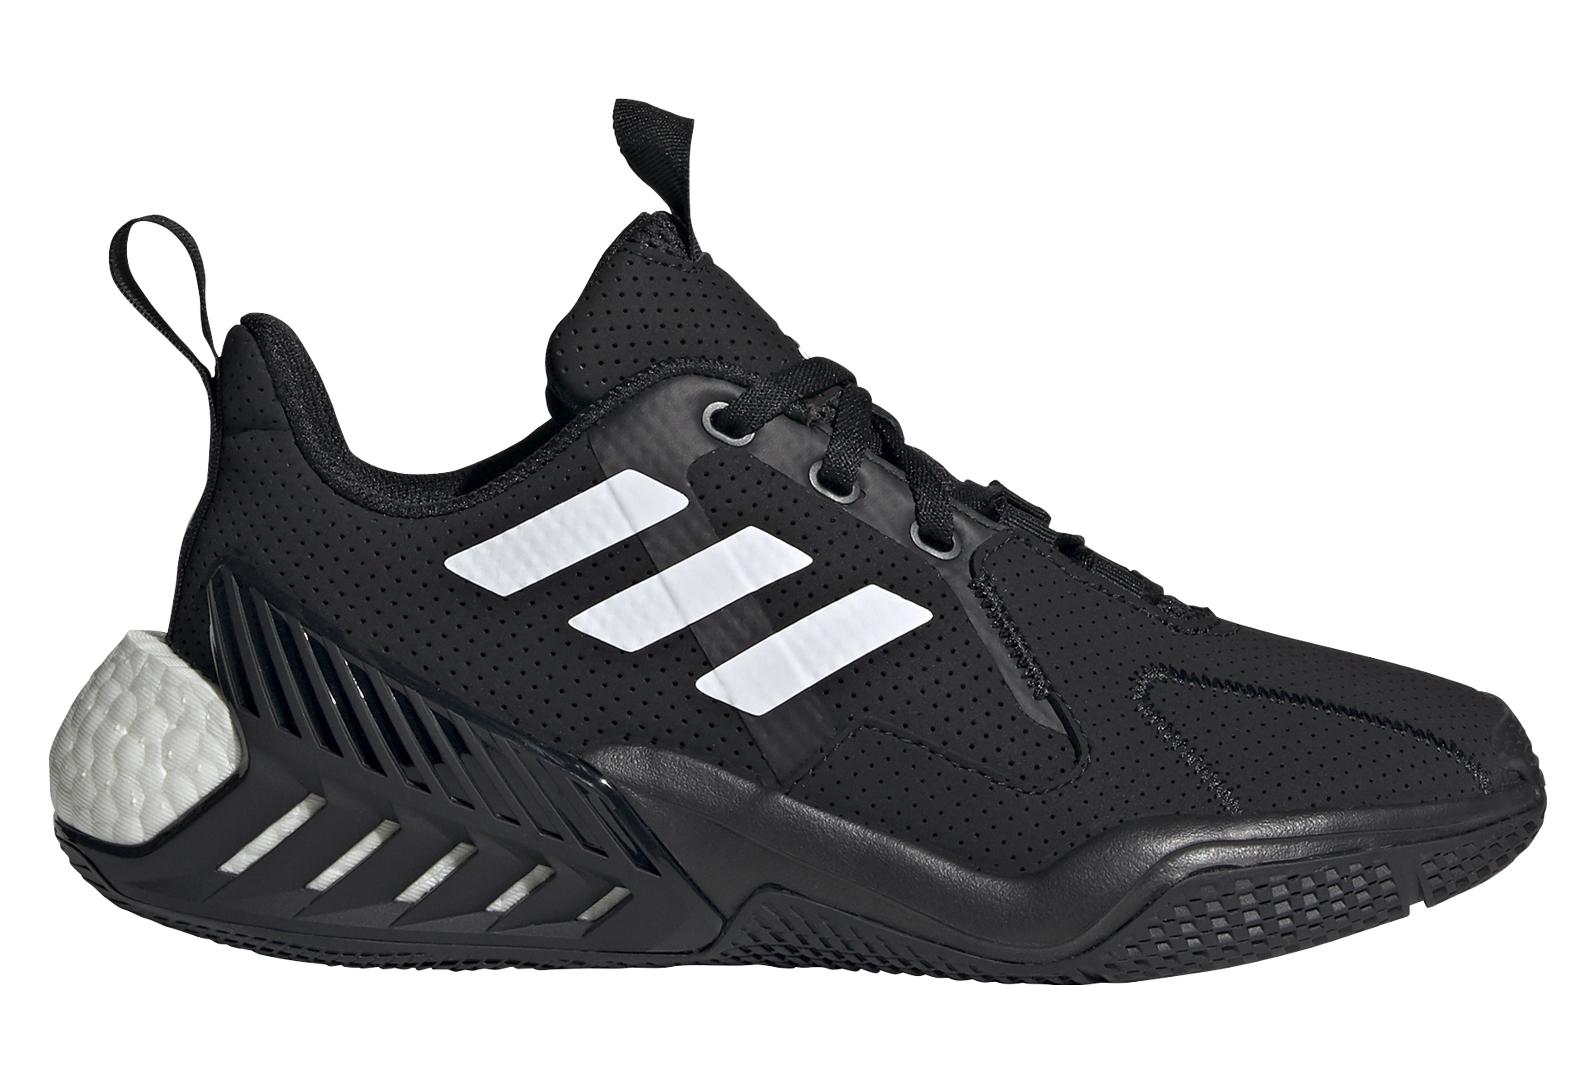 Chaussures junior adidas 4uture One Running | Alltricks.com